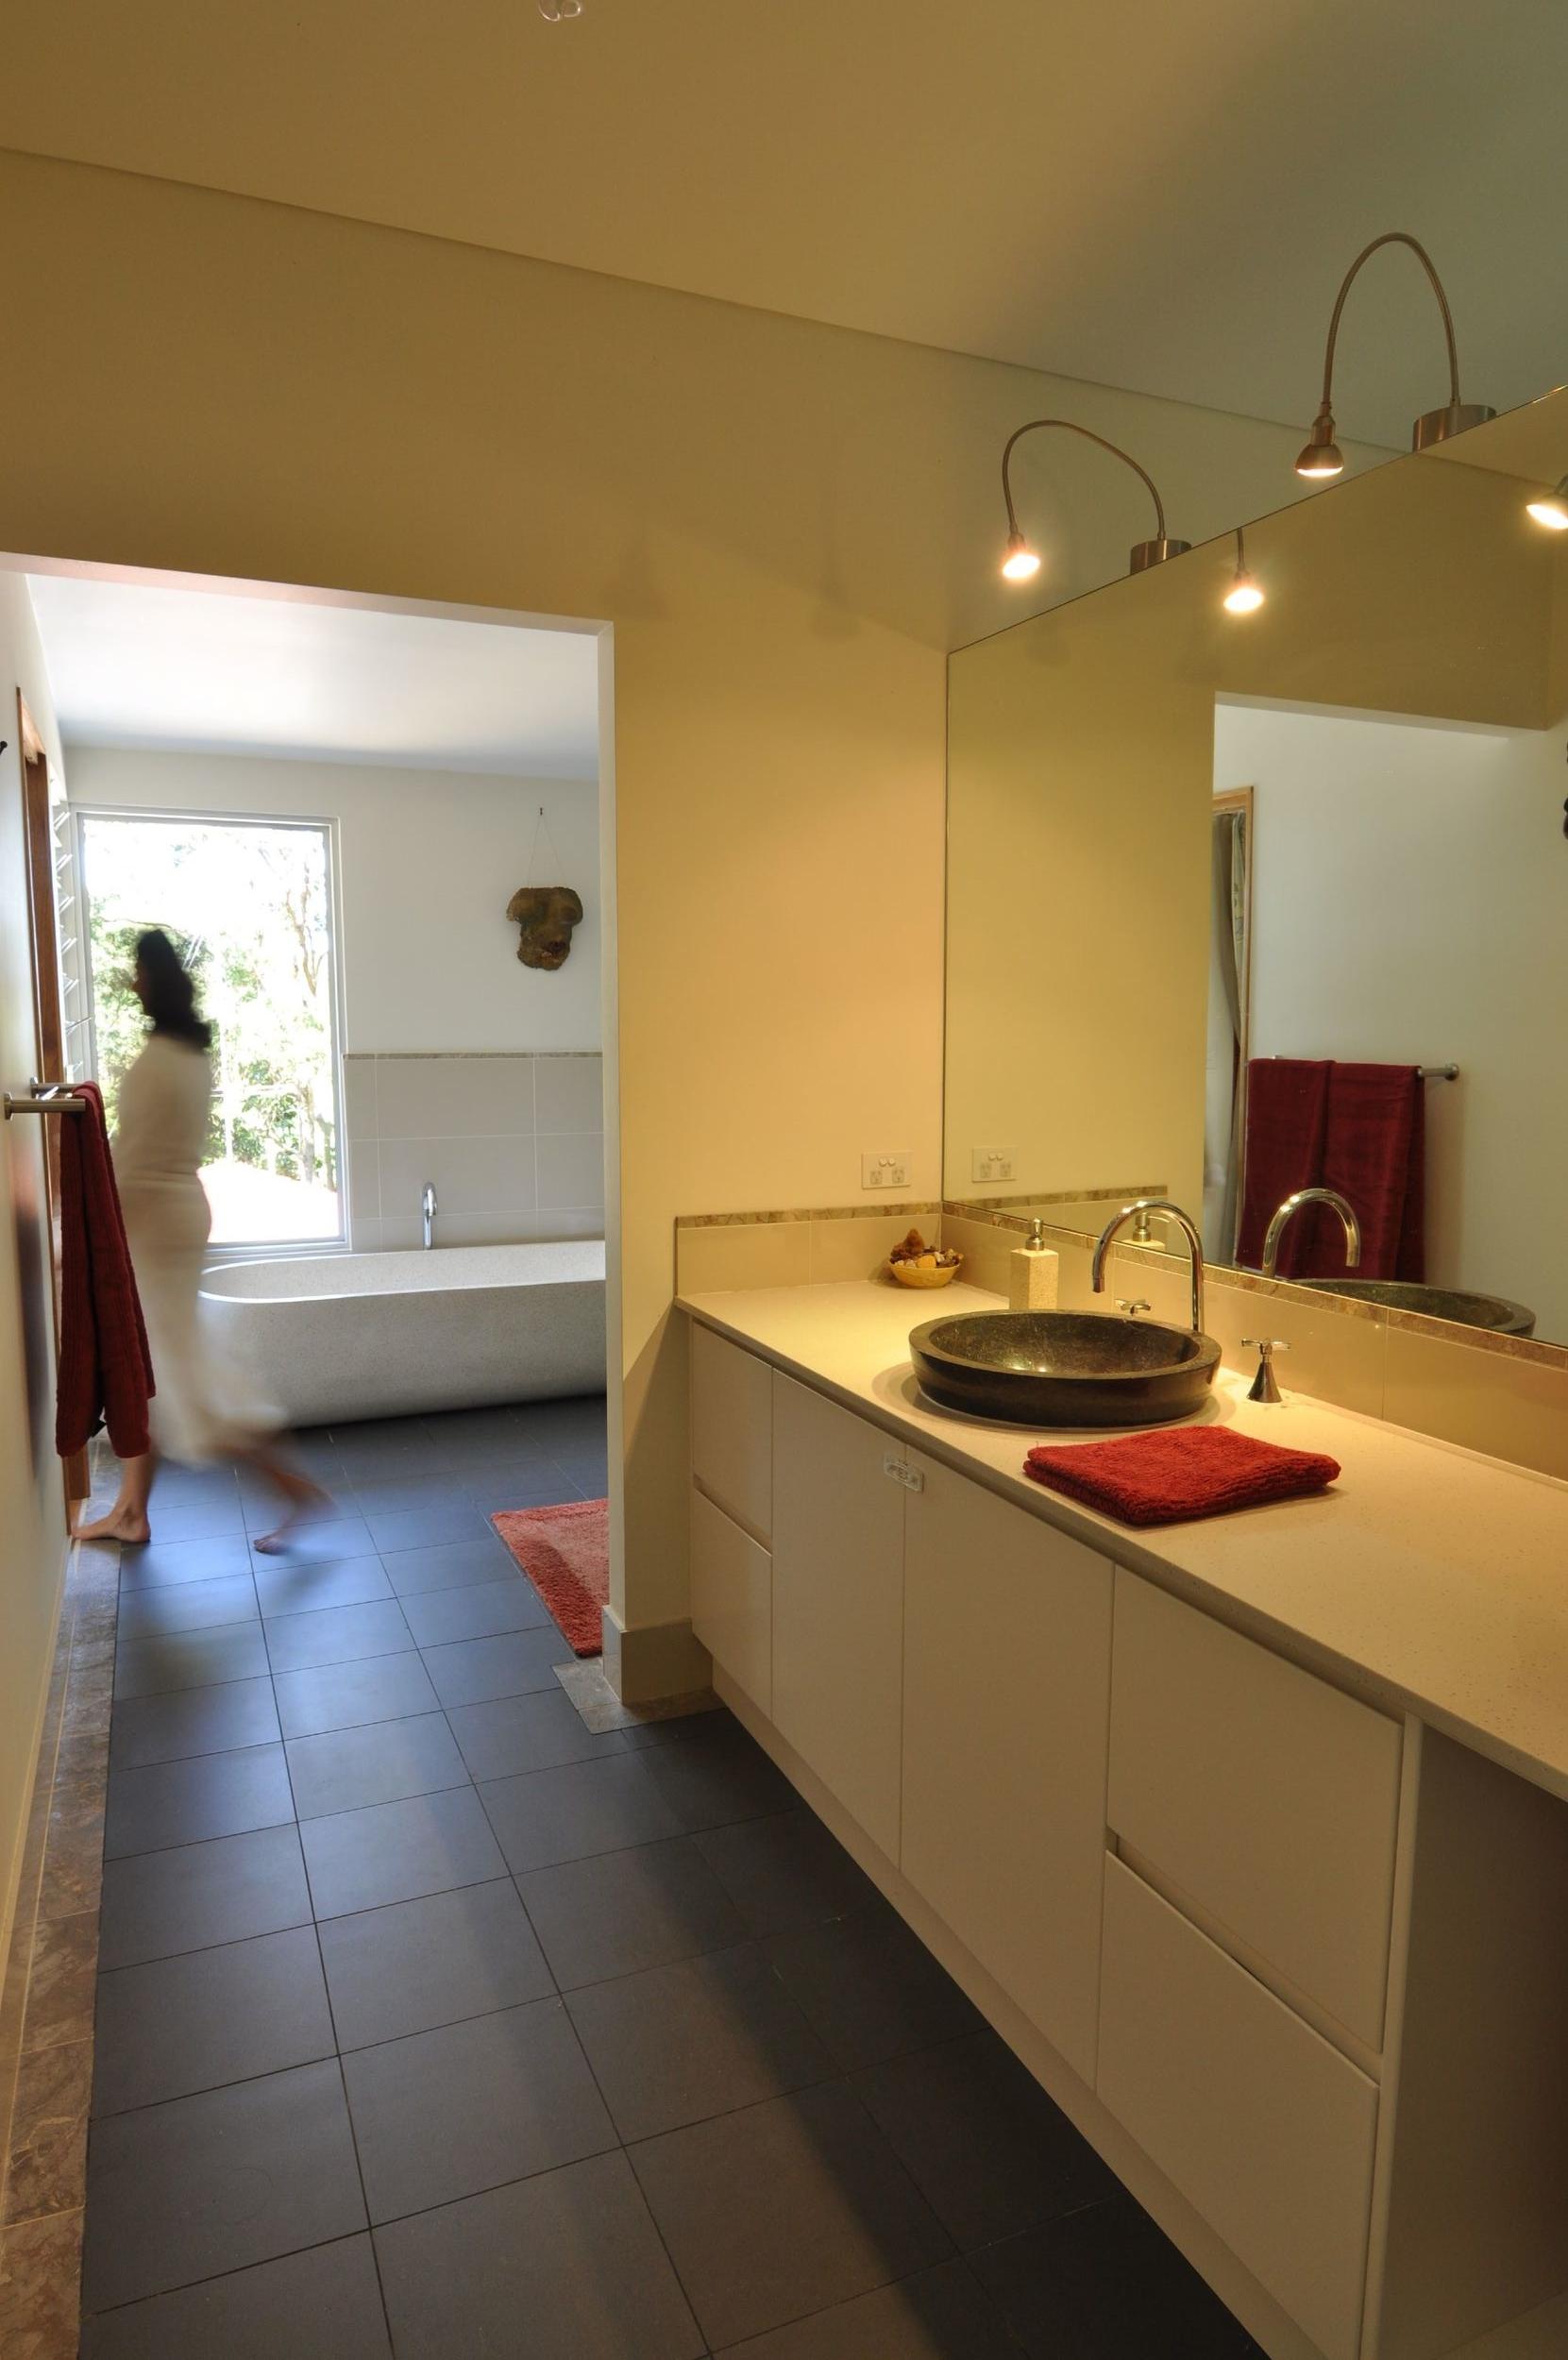 Nvisage_Custom_Home_Designs_Alterations-Additions_Kookas8.jpg